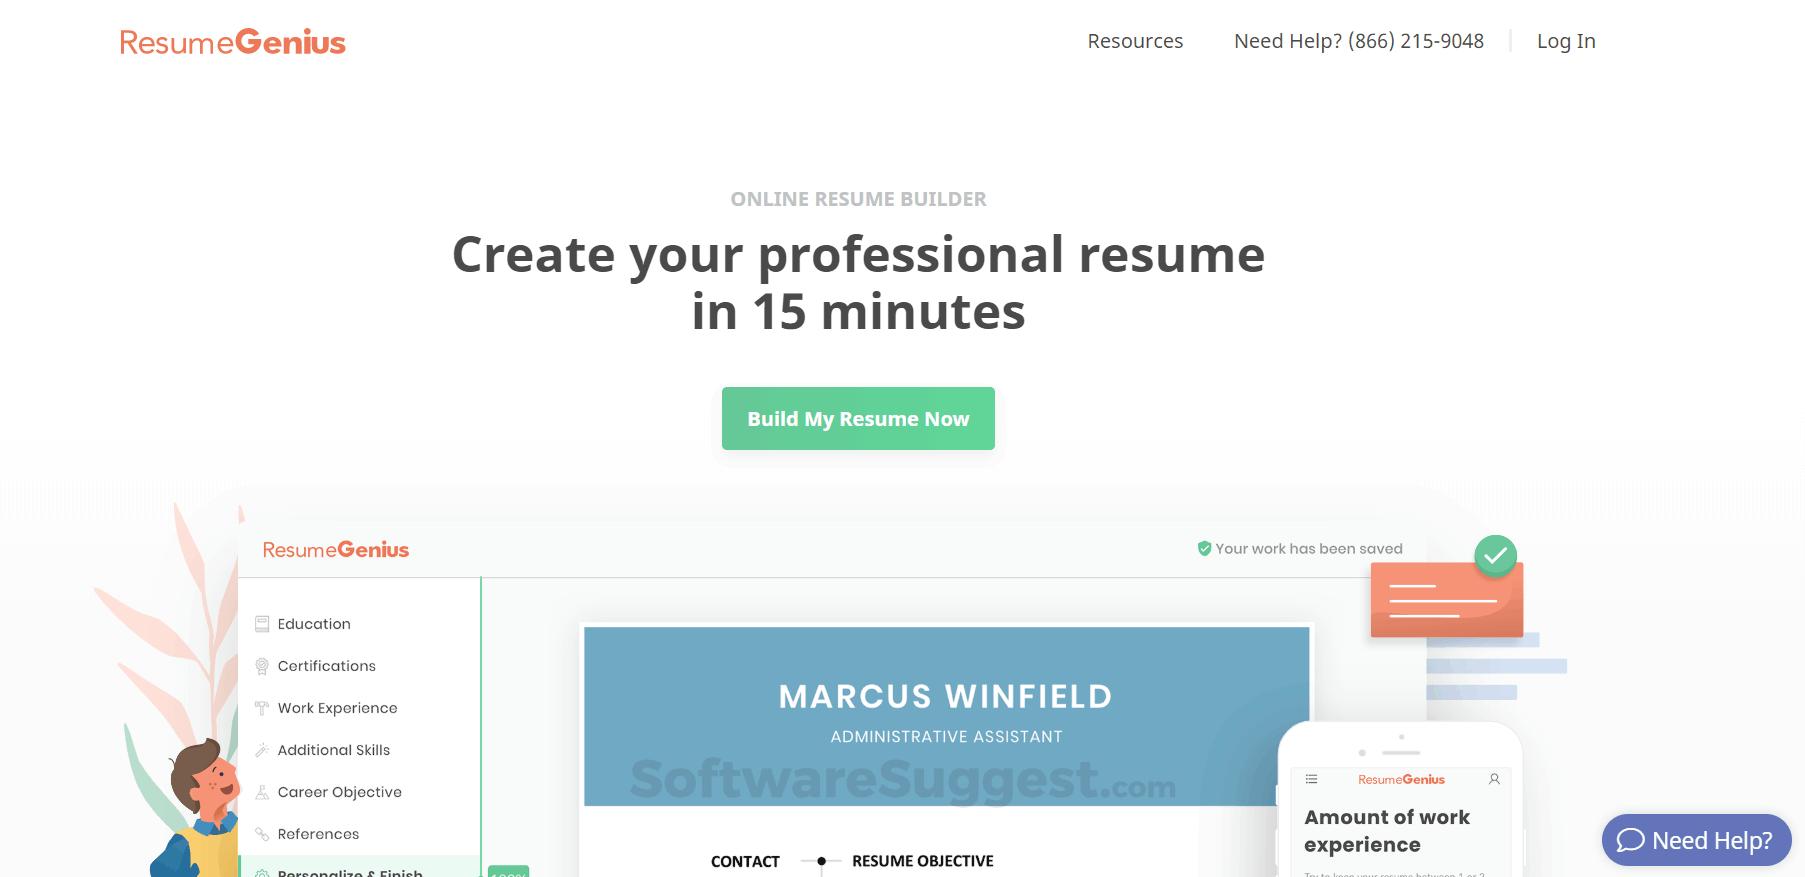 Resume Genius Pricing, Reviews, Features - Free Demo